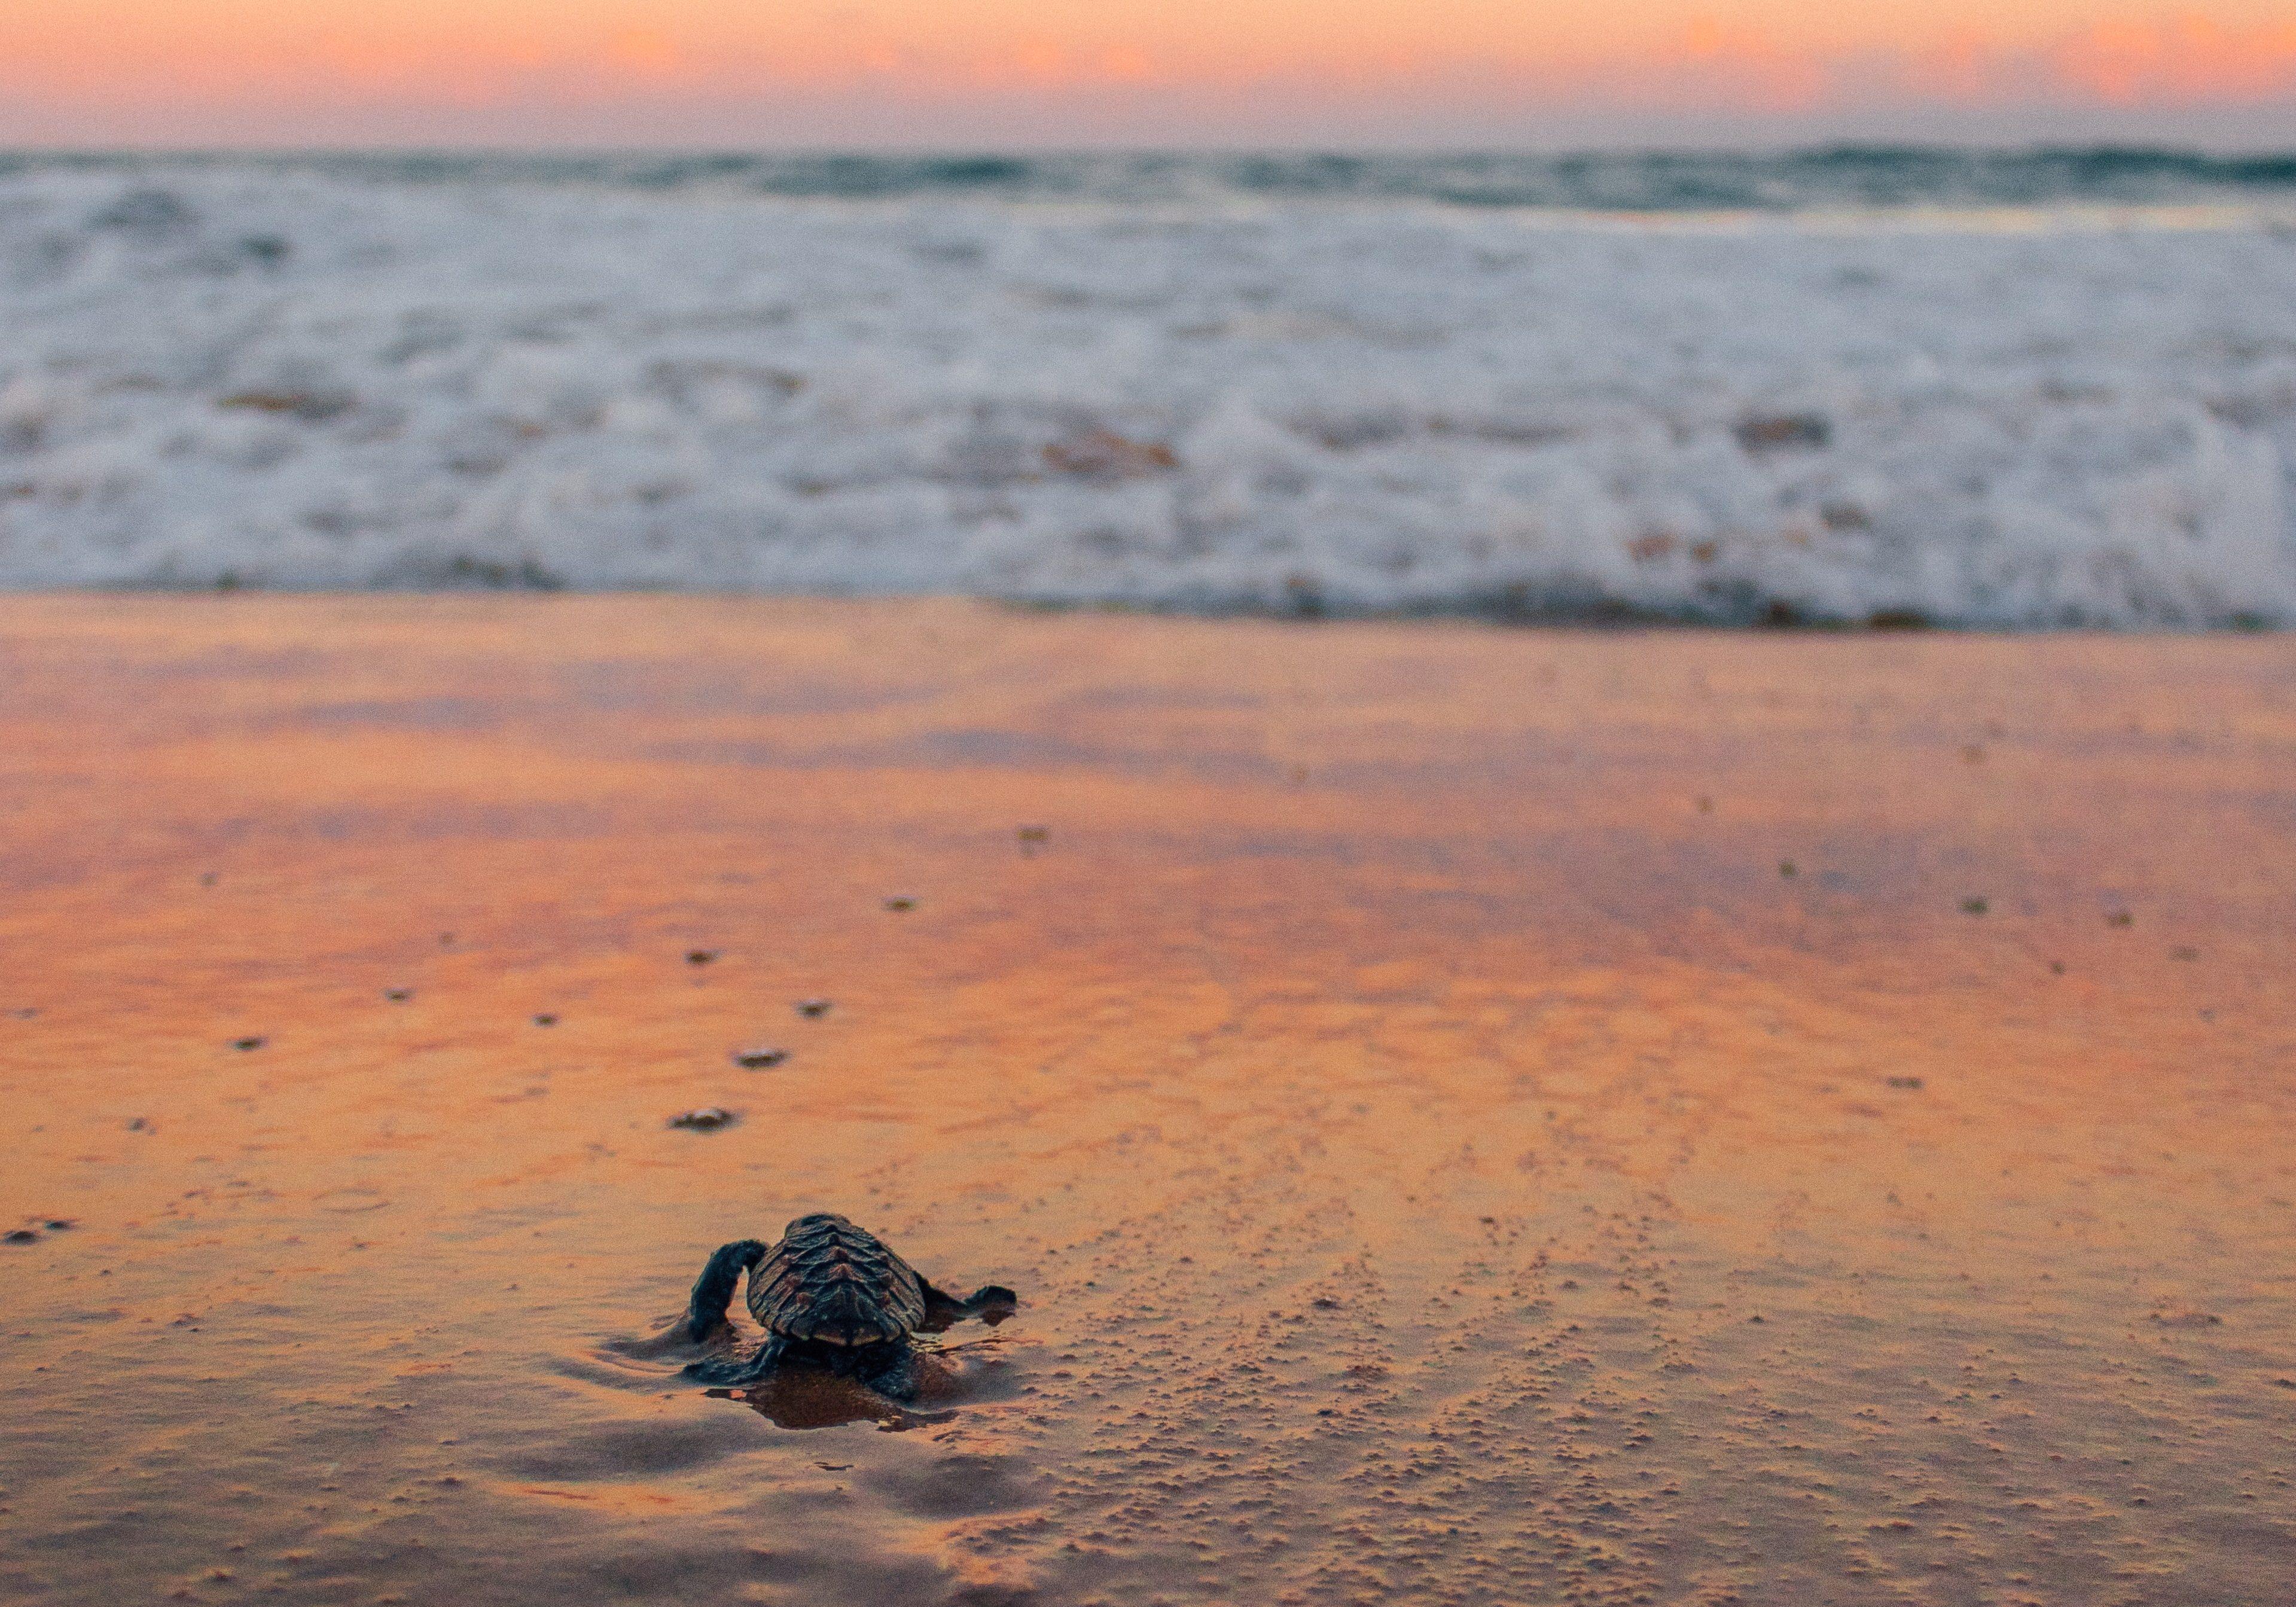 Turtle hatching on beach 1